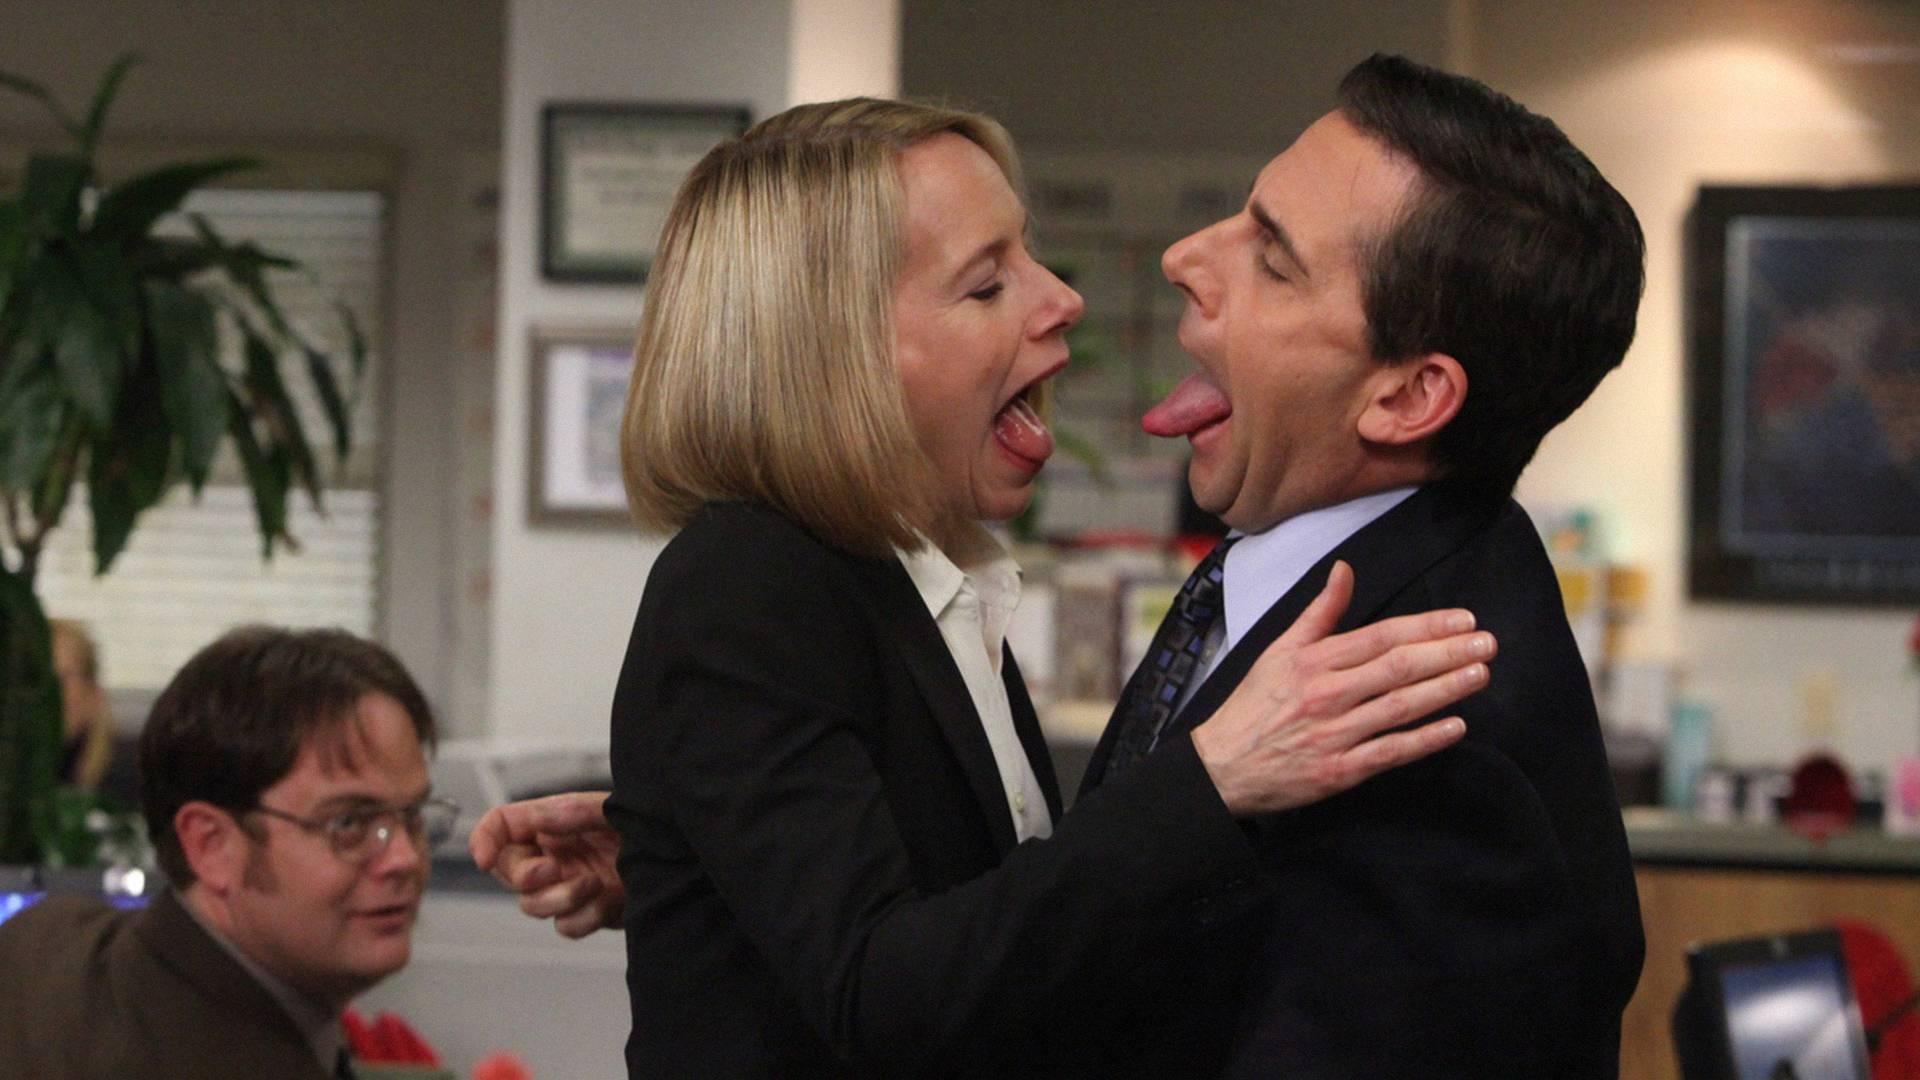 The Office Season 7 Episode 16